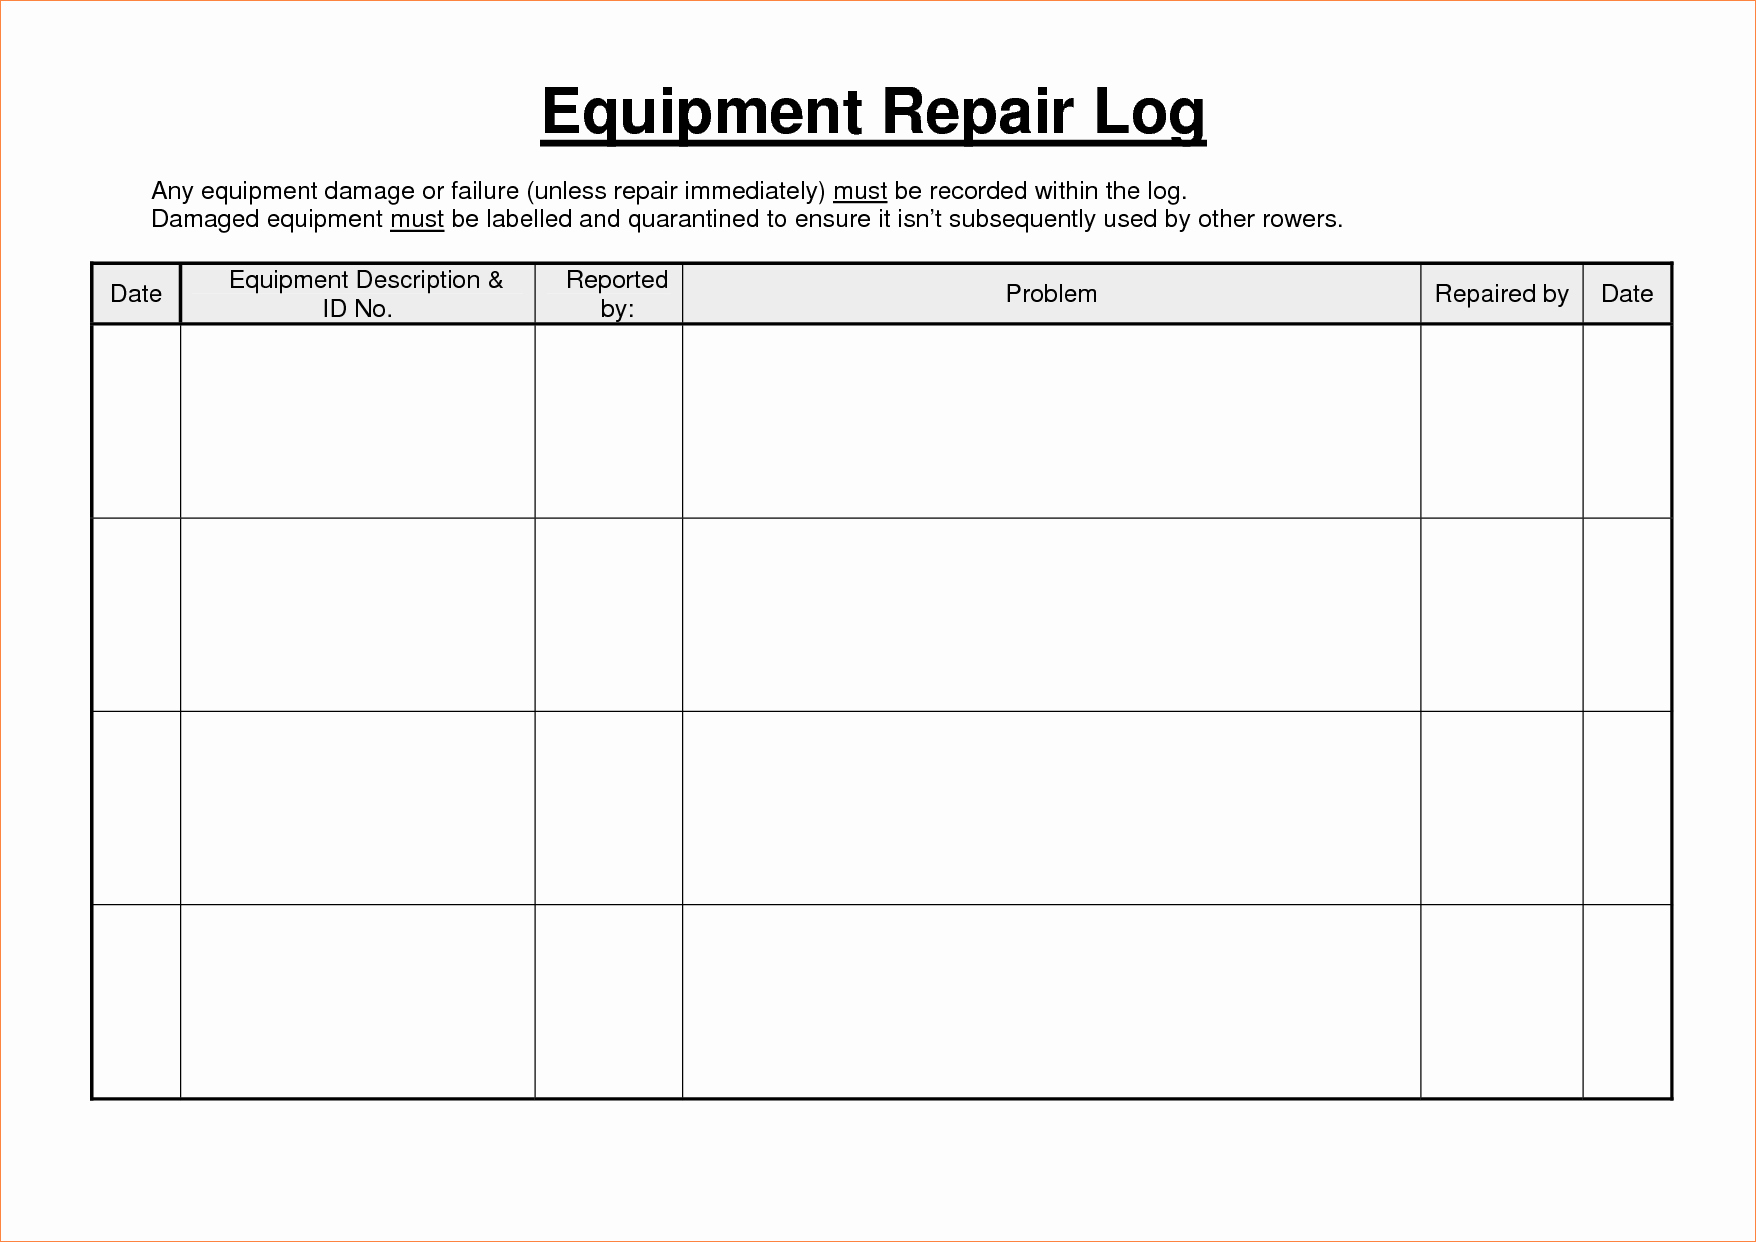 Equipment Maintenance Log Template Excel Inspirational 5 Equipment Maintenance Log